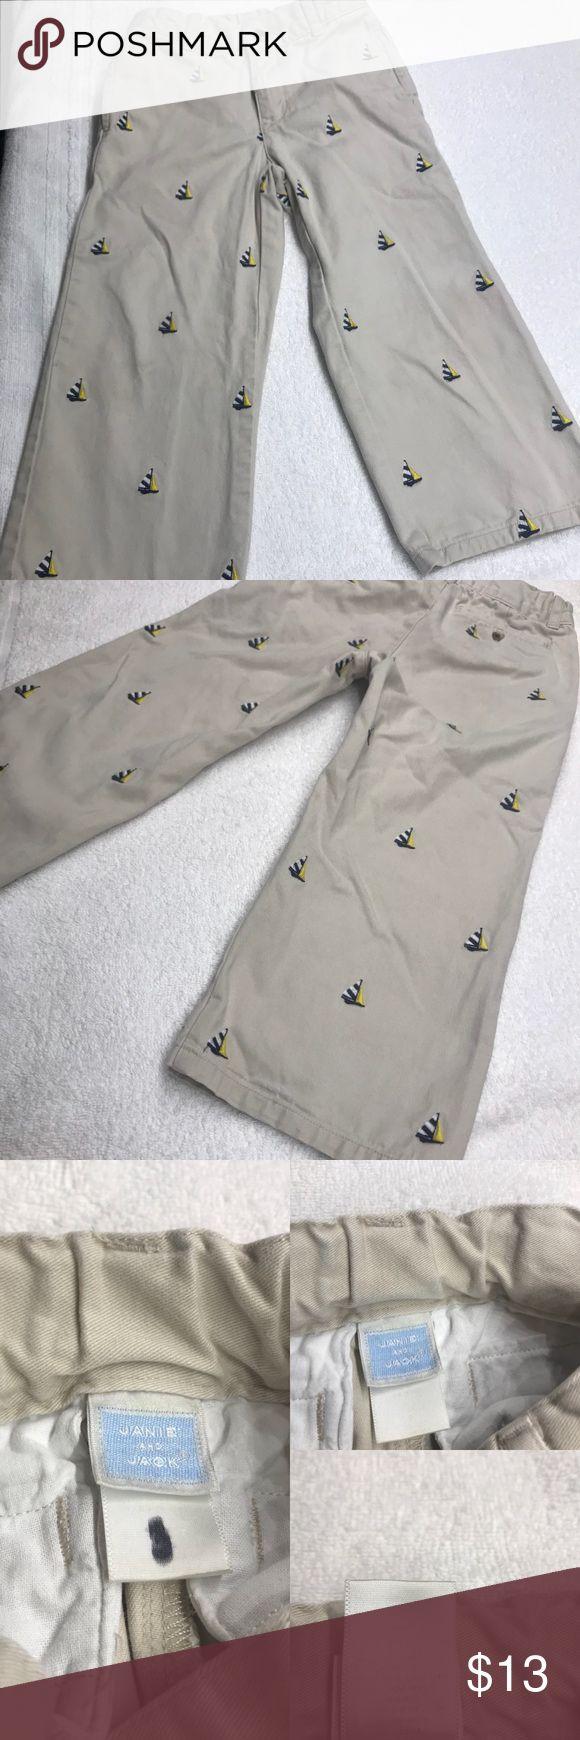 VGUC 3T Janie U0026 Jack Khaki Pants With Sailboats